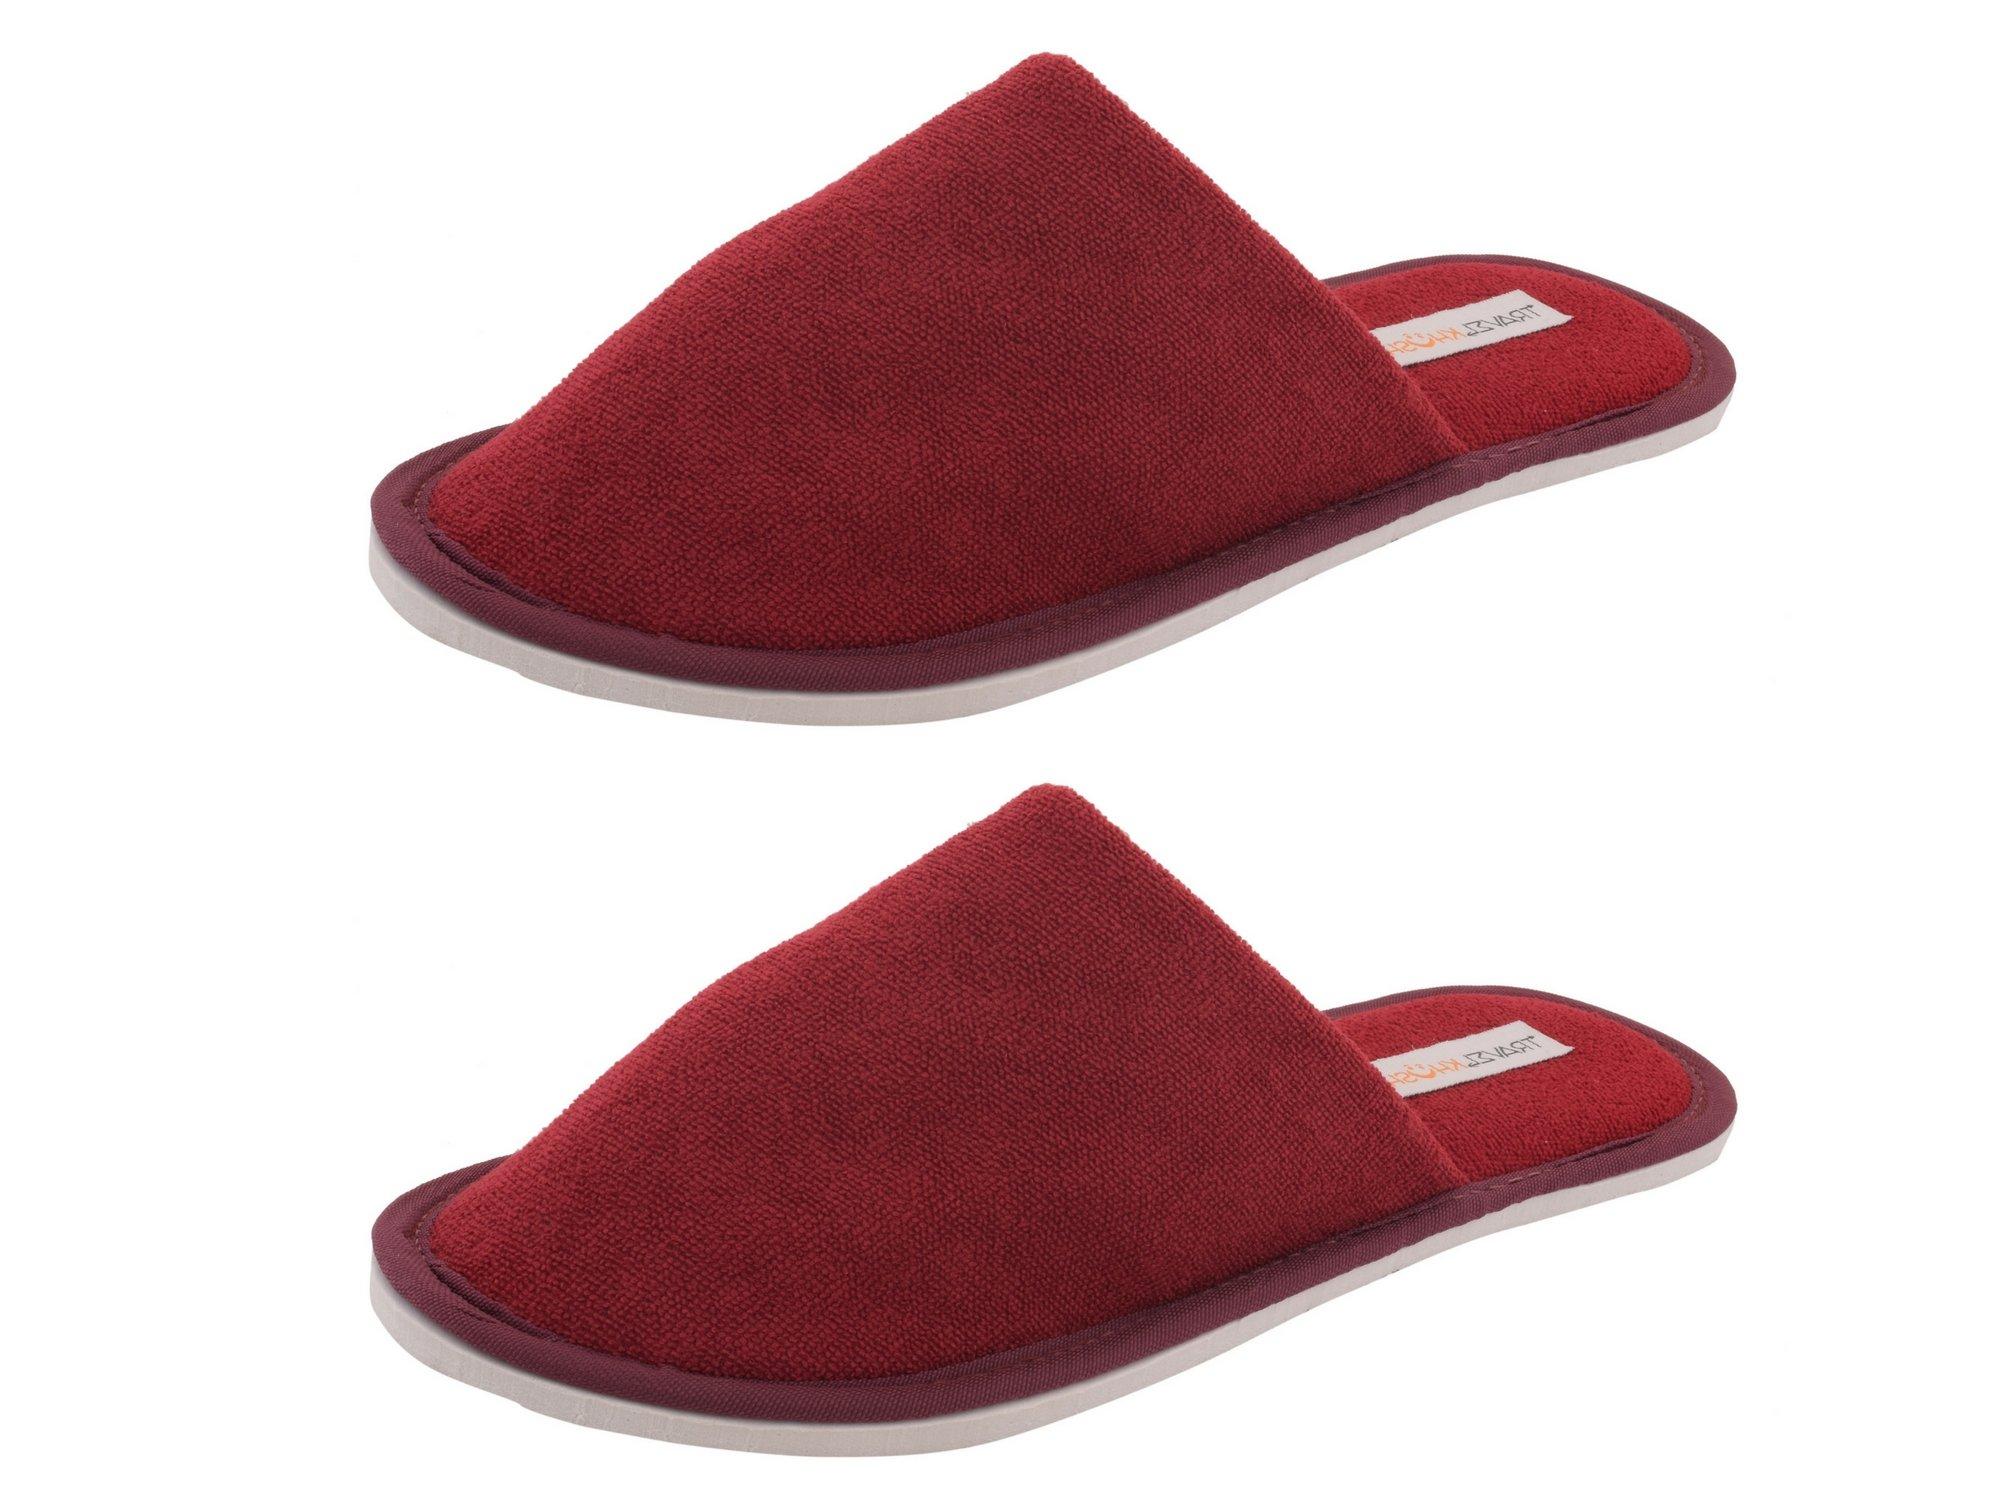 Travelkhushi Unisex's Red Loafers-9 UK/India (43 EU) (Com2-CTMR-9) (B071S6ZS9C) Amazon Price History, Amazon Price Tracker